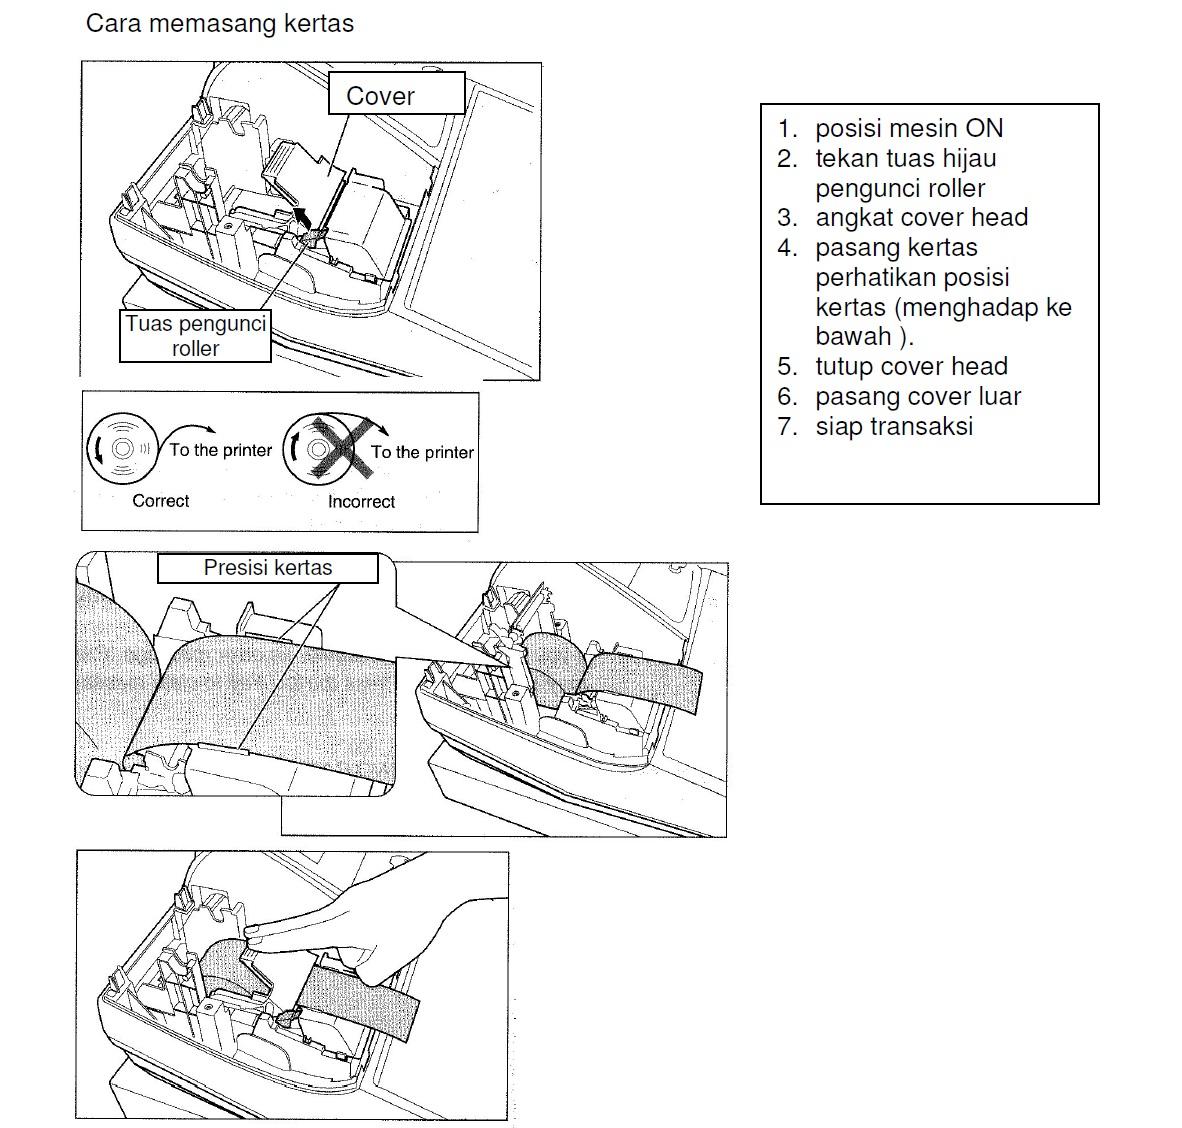 cara memasang kertas pada mesin kasir cash register sharp xe a 203 posisi  mesin ON - tekan tuas hijau - angkat cover head - pasang kertas - tutup  cover head ...